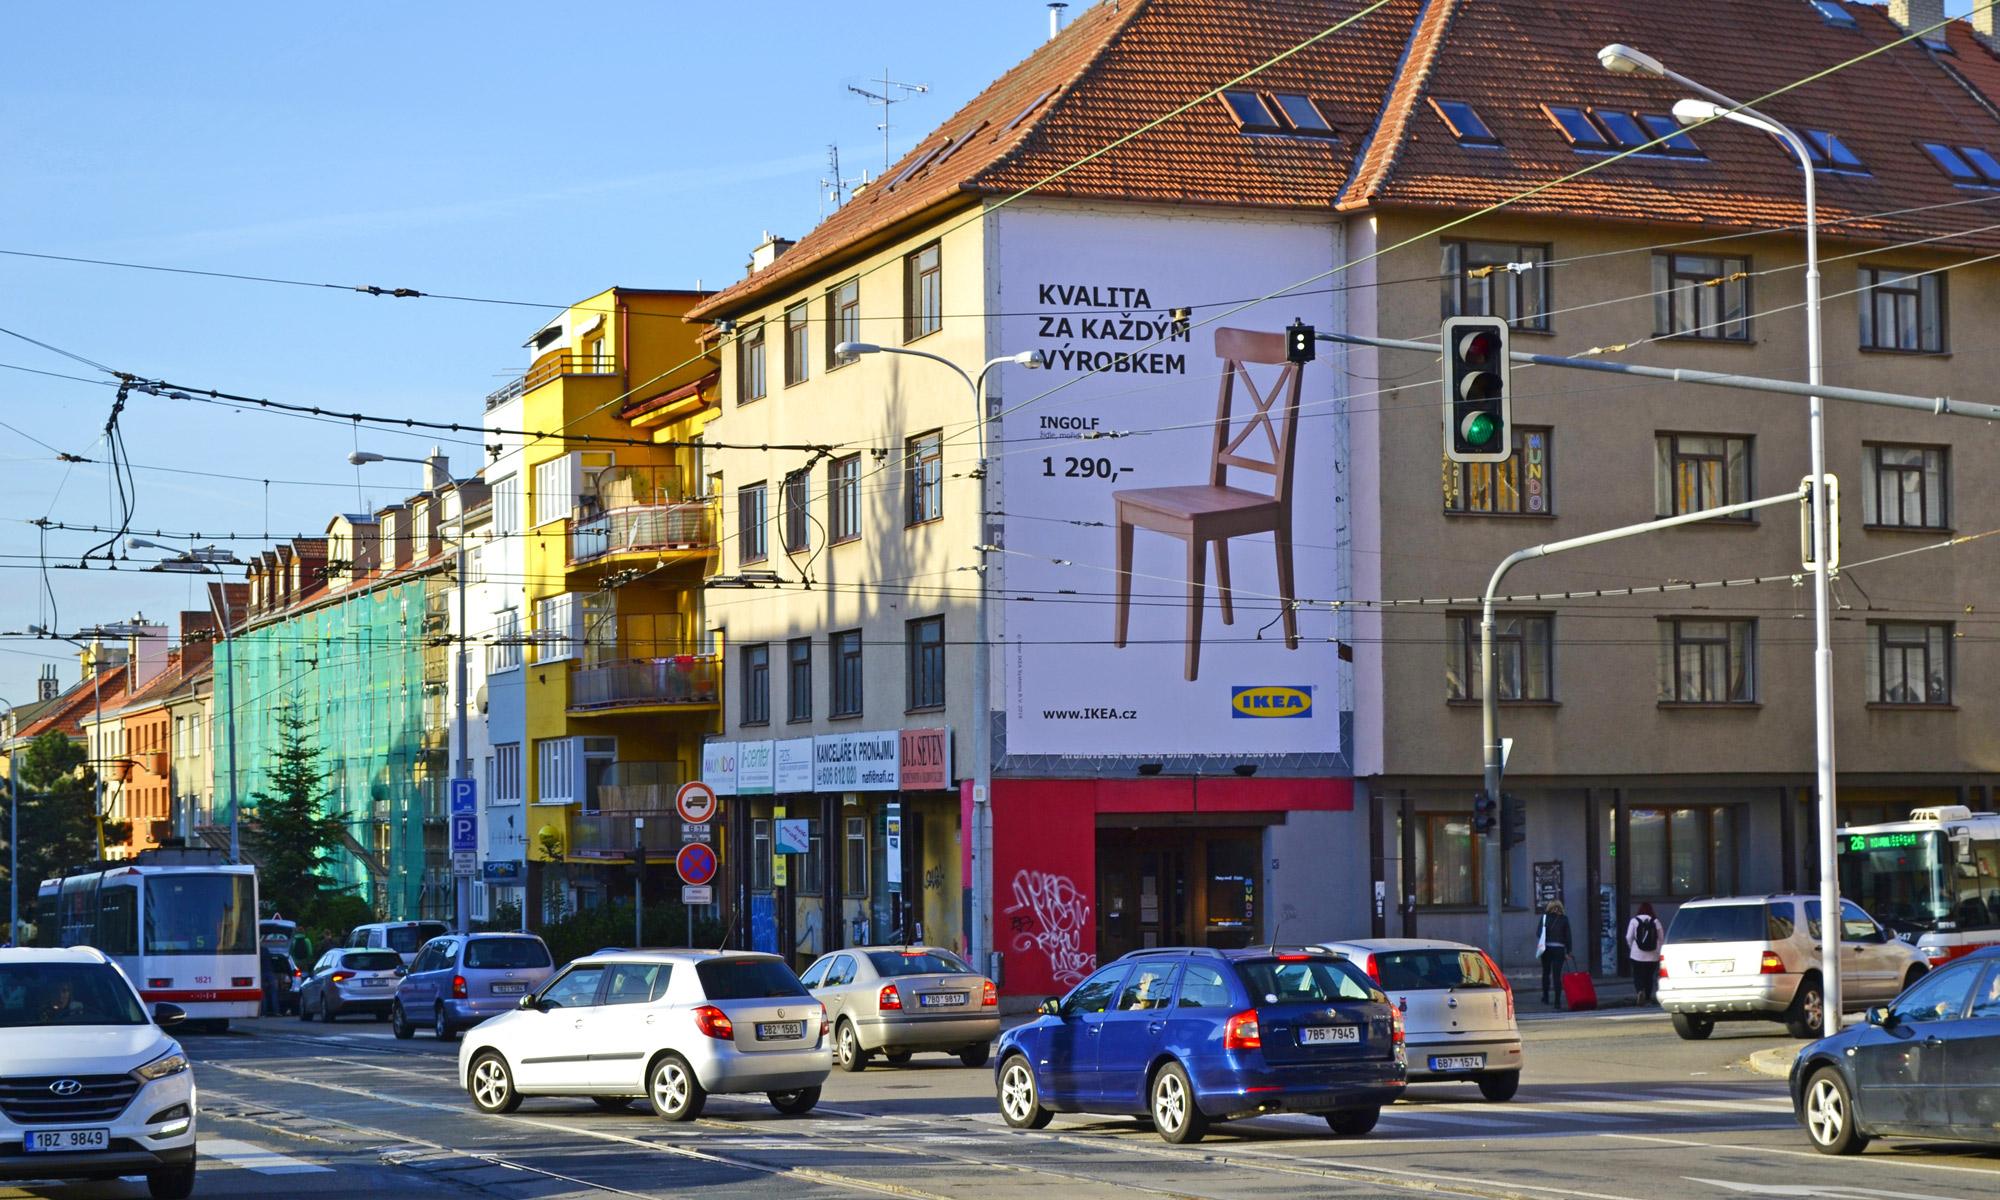 WEREK-MEDIA-Reklamni-plochy-Brno---023ZB-Provaznikova---klient-IKEA---OOH-kampan-10-2018- (3)